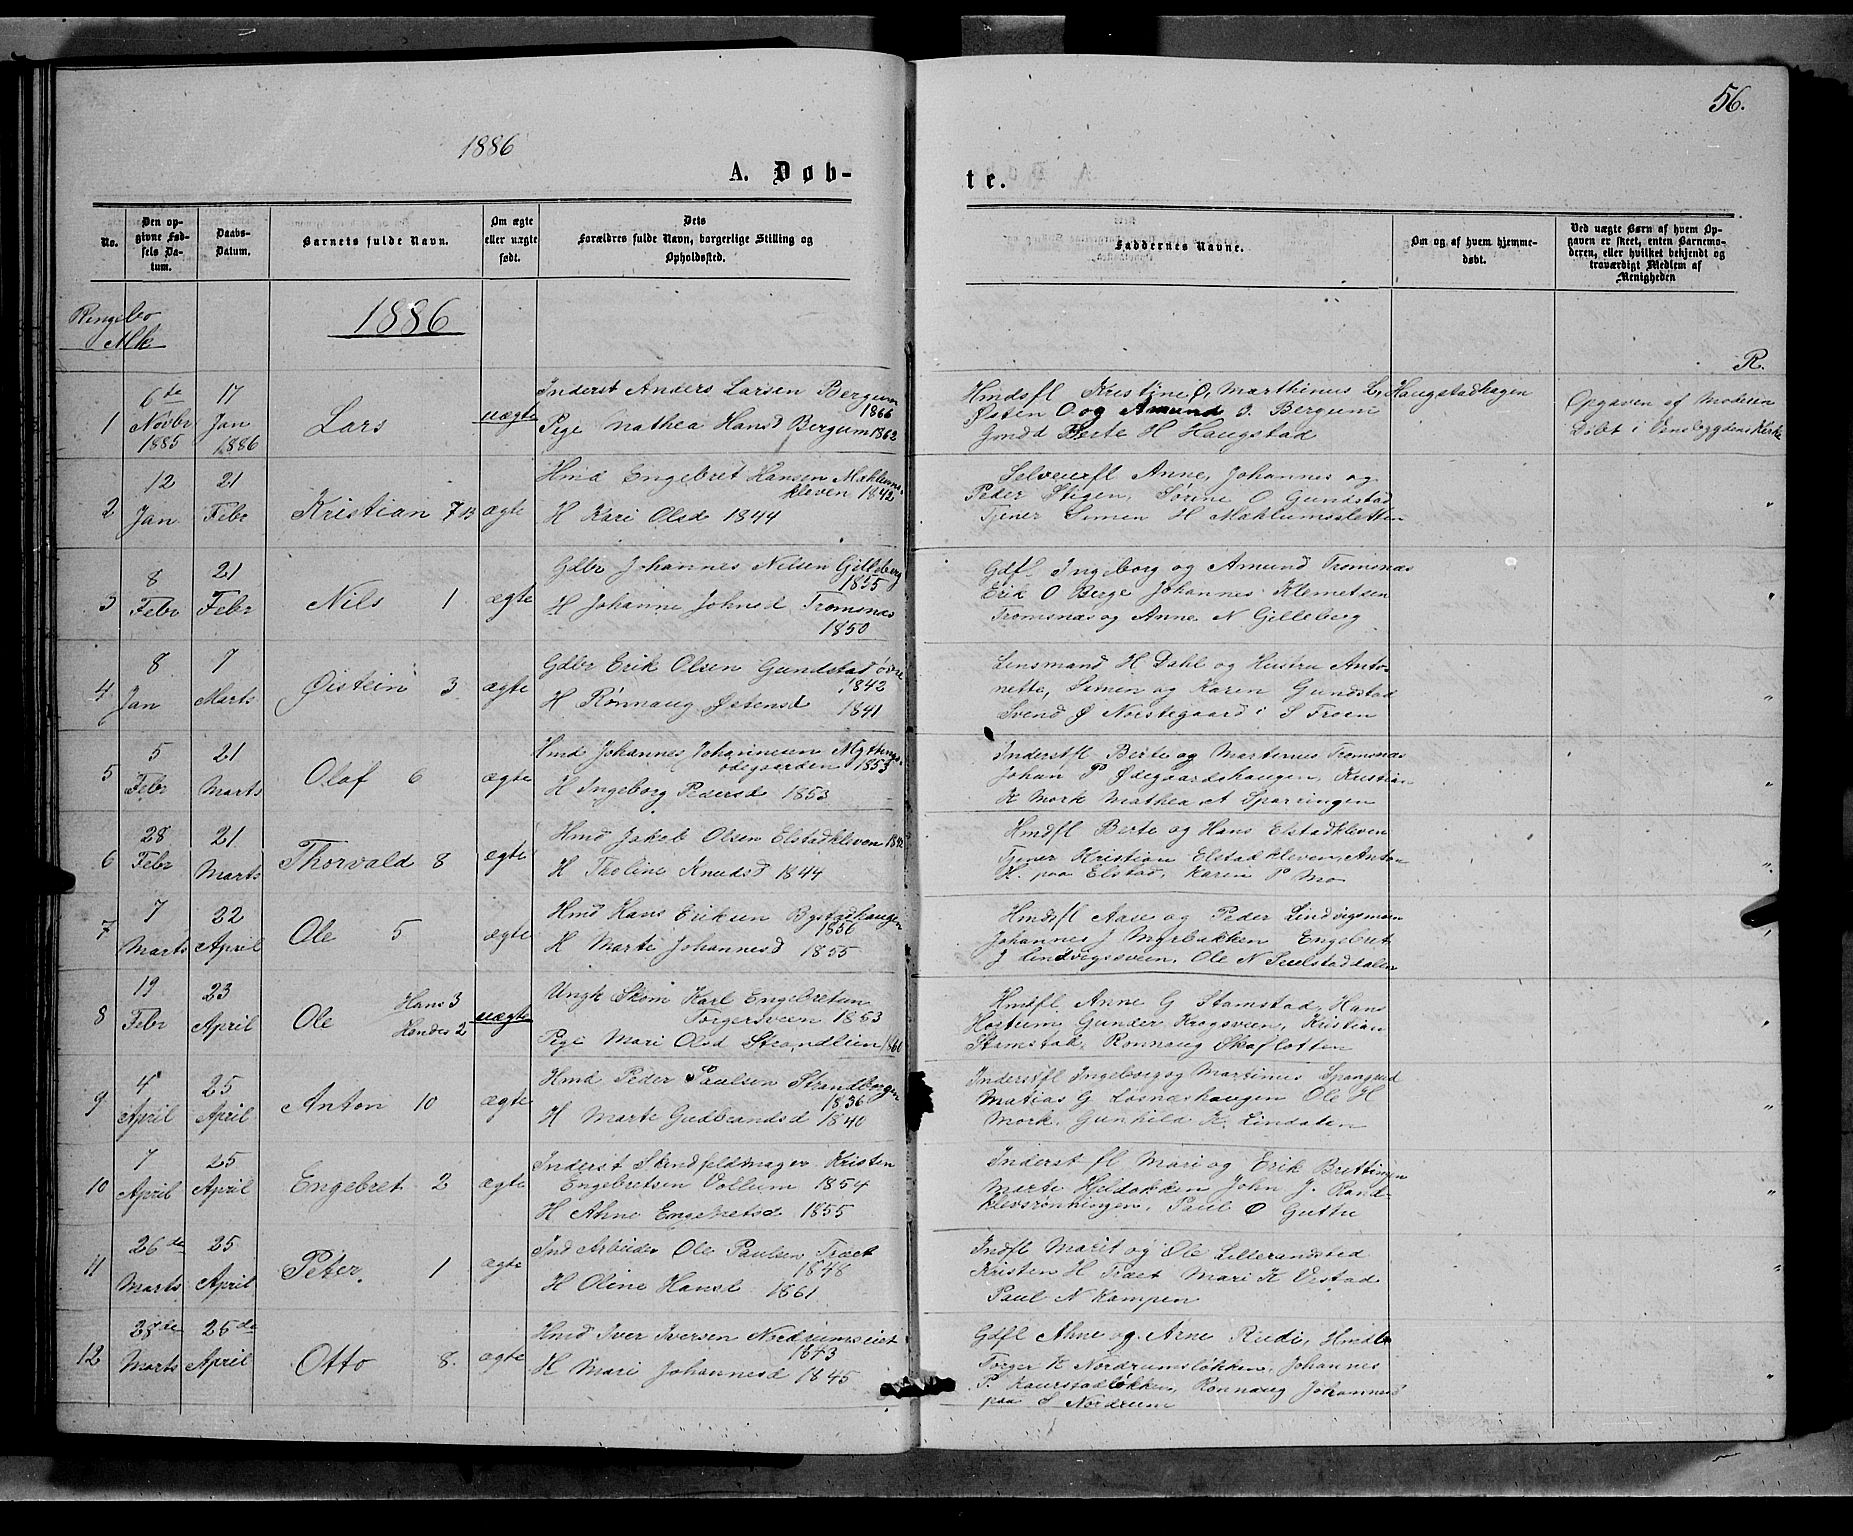 SAH, Ringebu prestekontor, Klokkerbok nr. 6, 1880-1898, s. 56